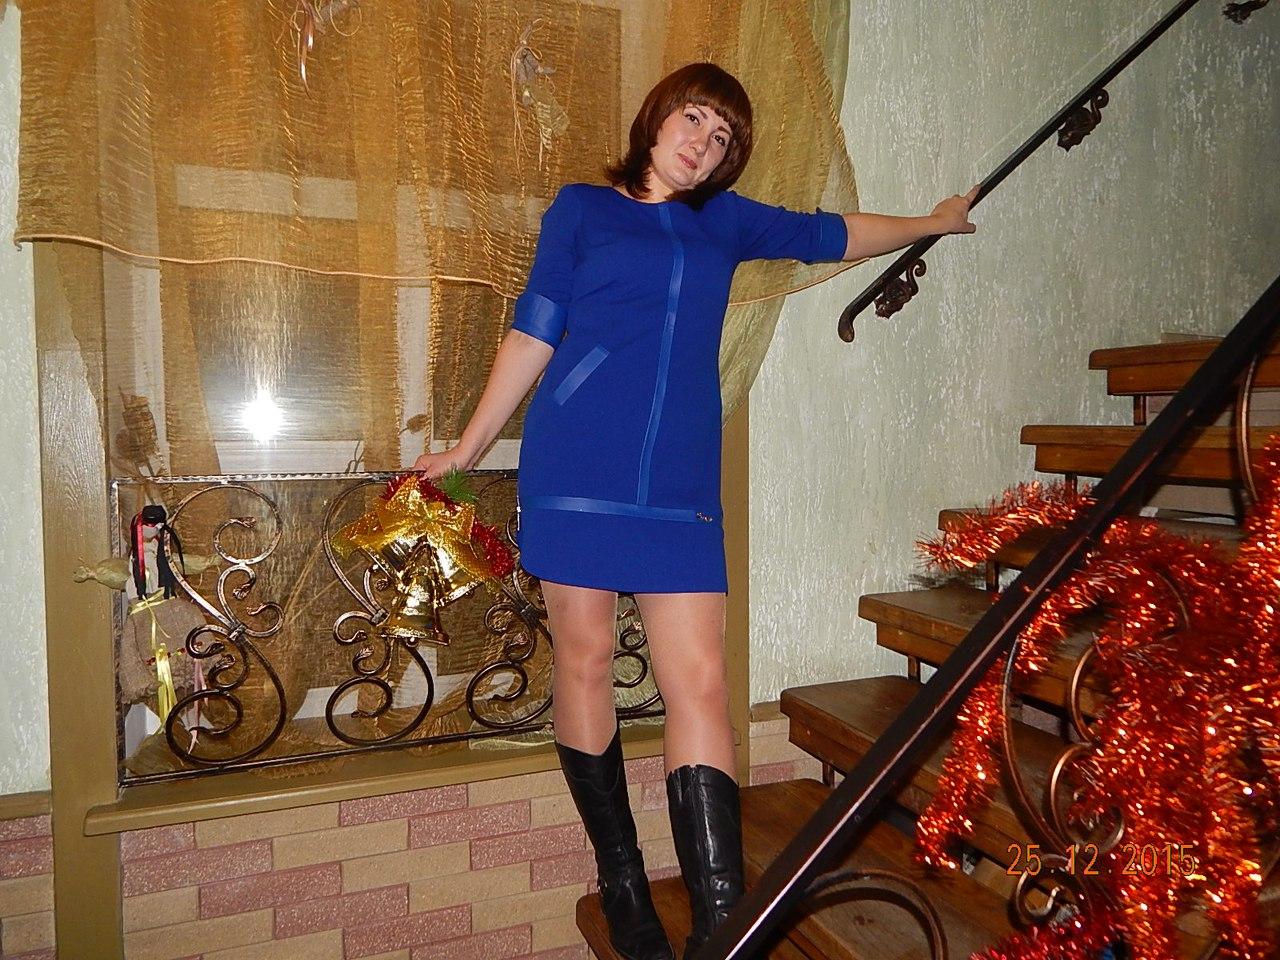 Lyubanya Fursa, Mirgorod - photo №13